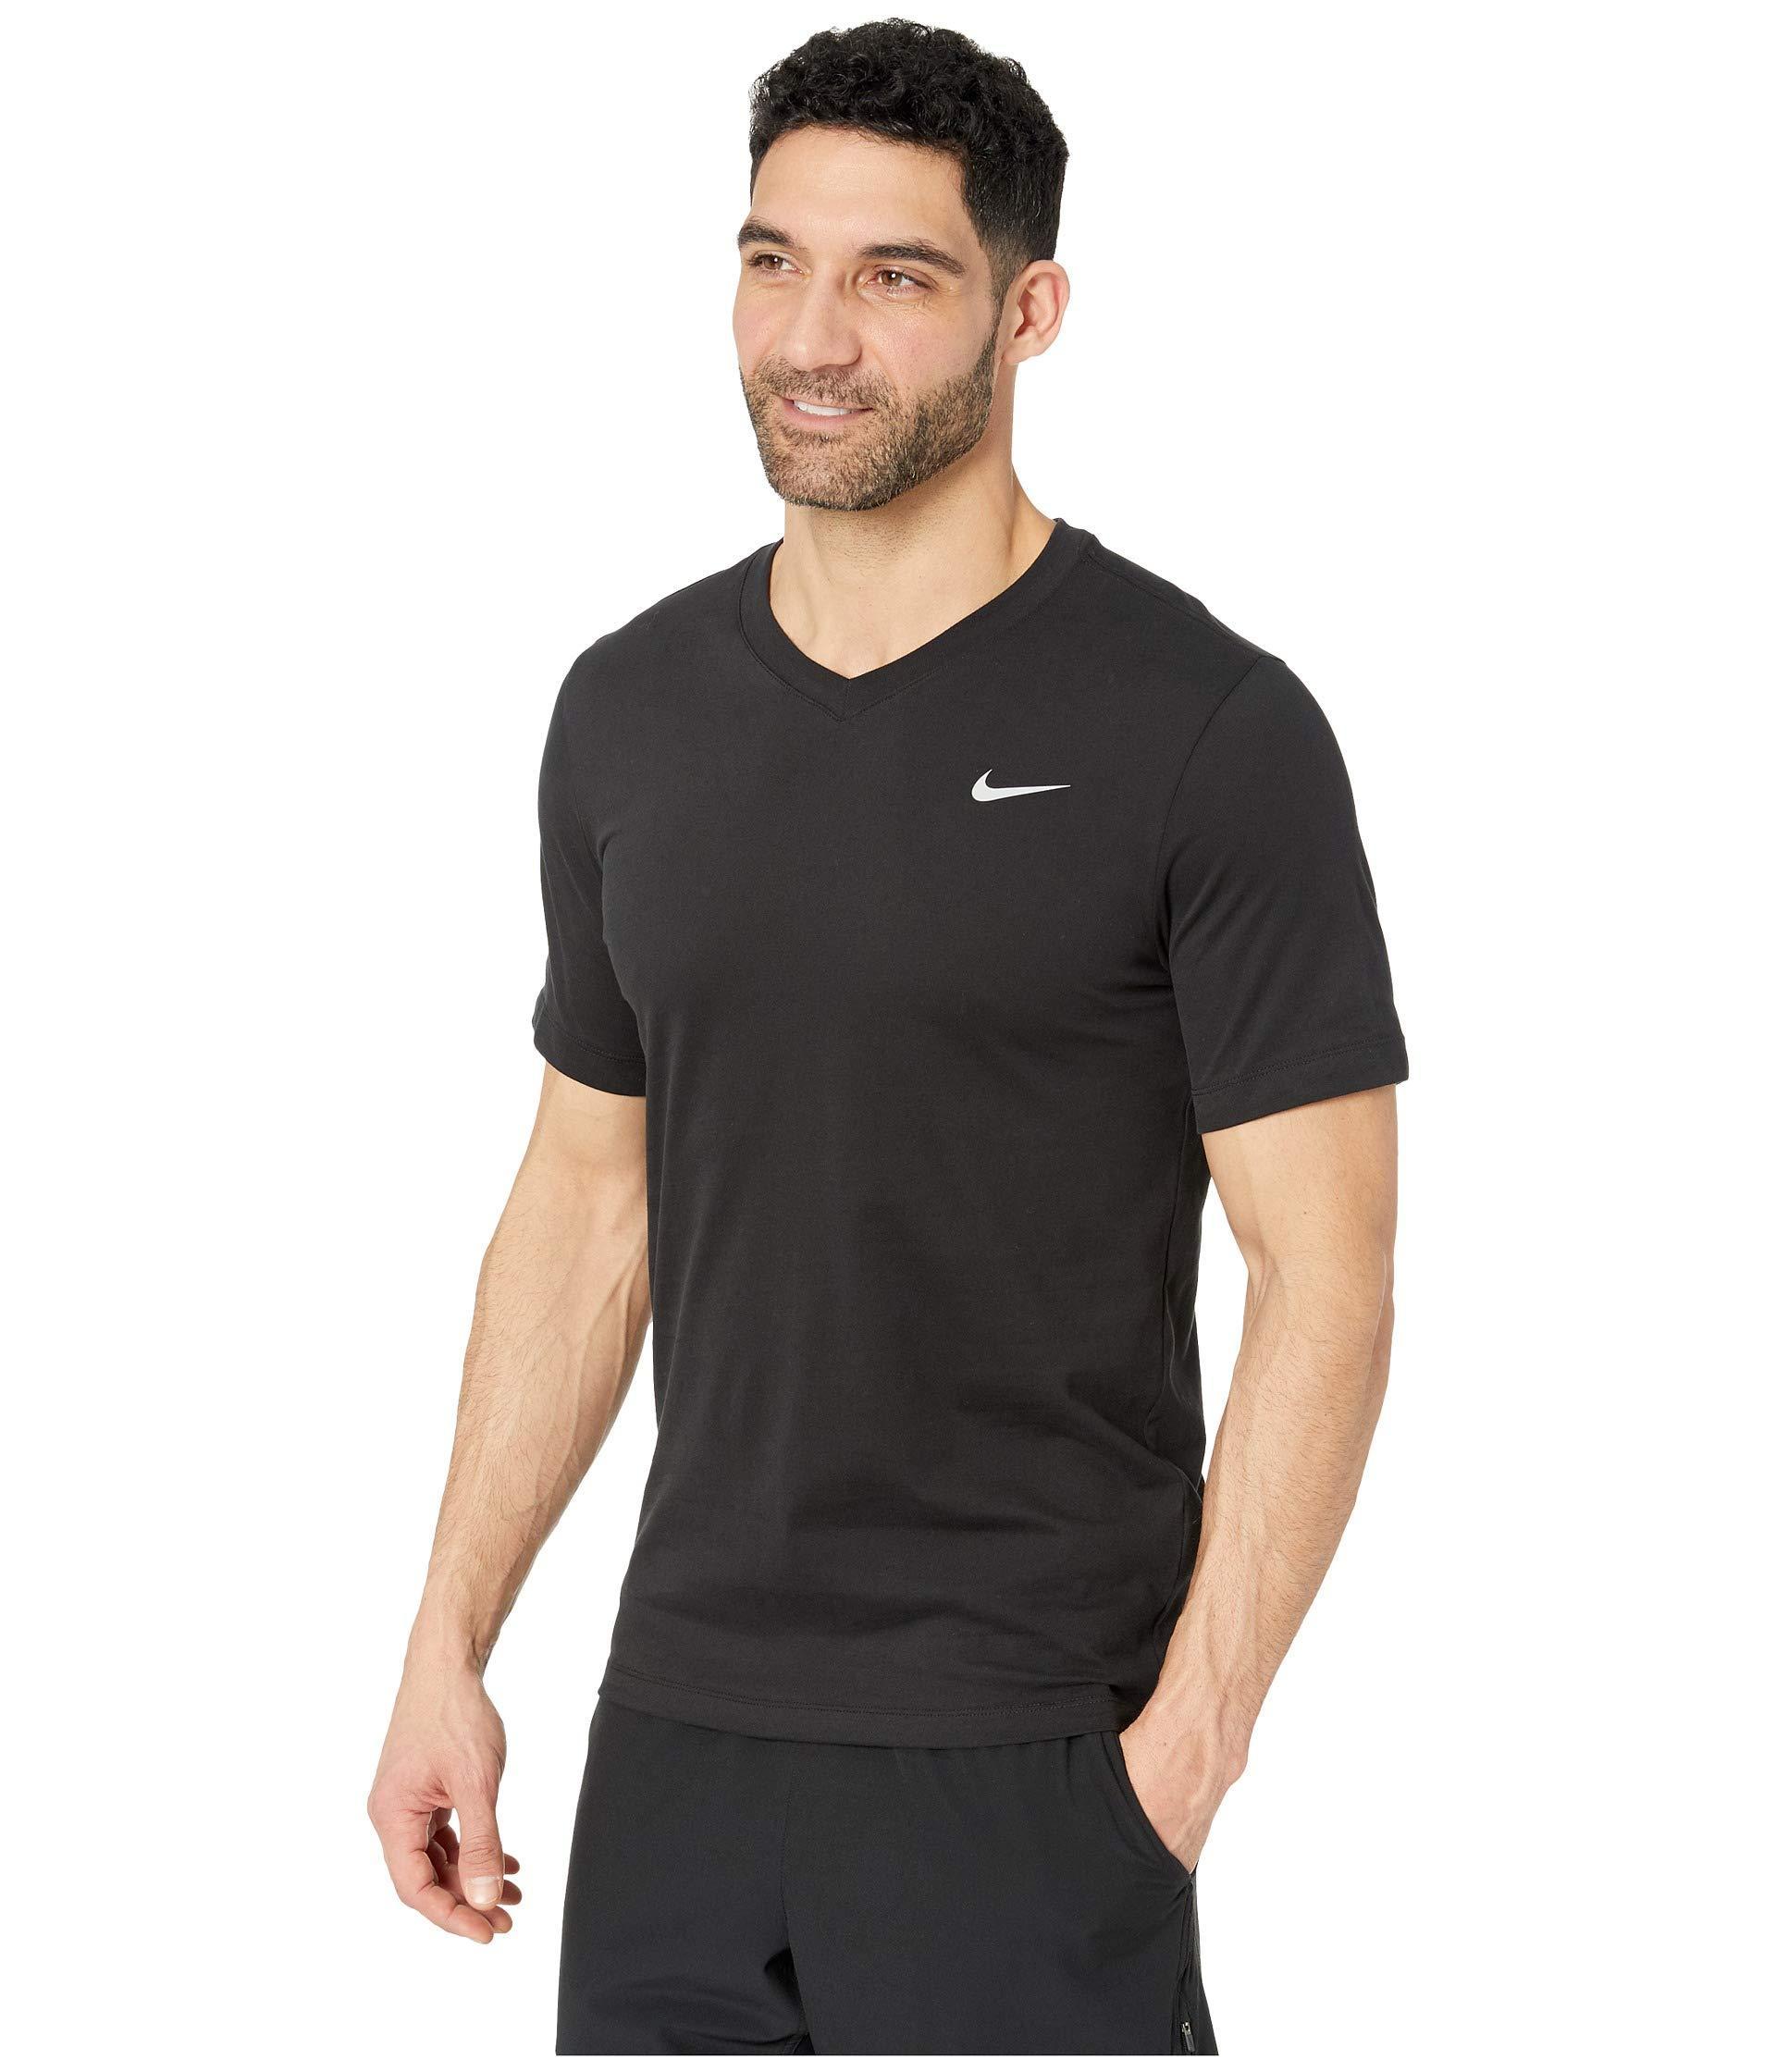 2cd78f70 Lyst - Nike Dry Tee Dri-fit Cotton V Solid (indigo Fog/light Armory  Blue/black) Men's Clothing in Black for Men